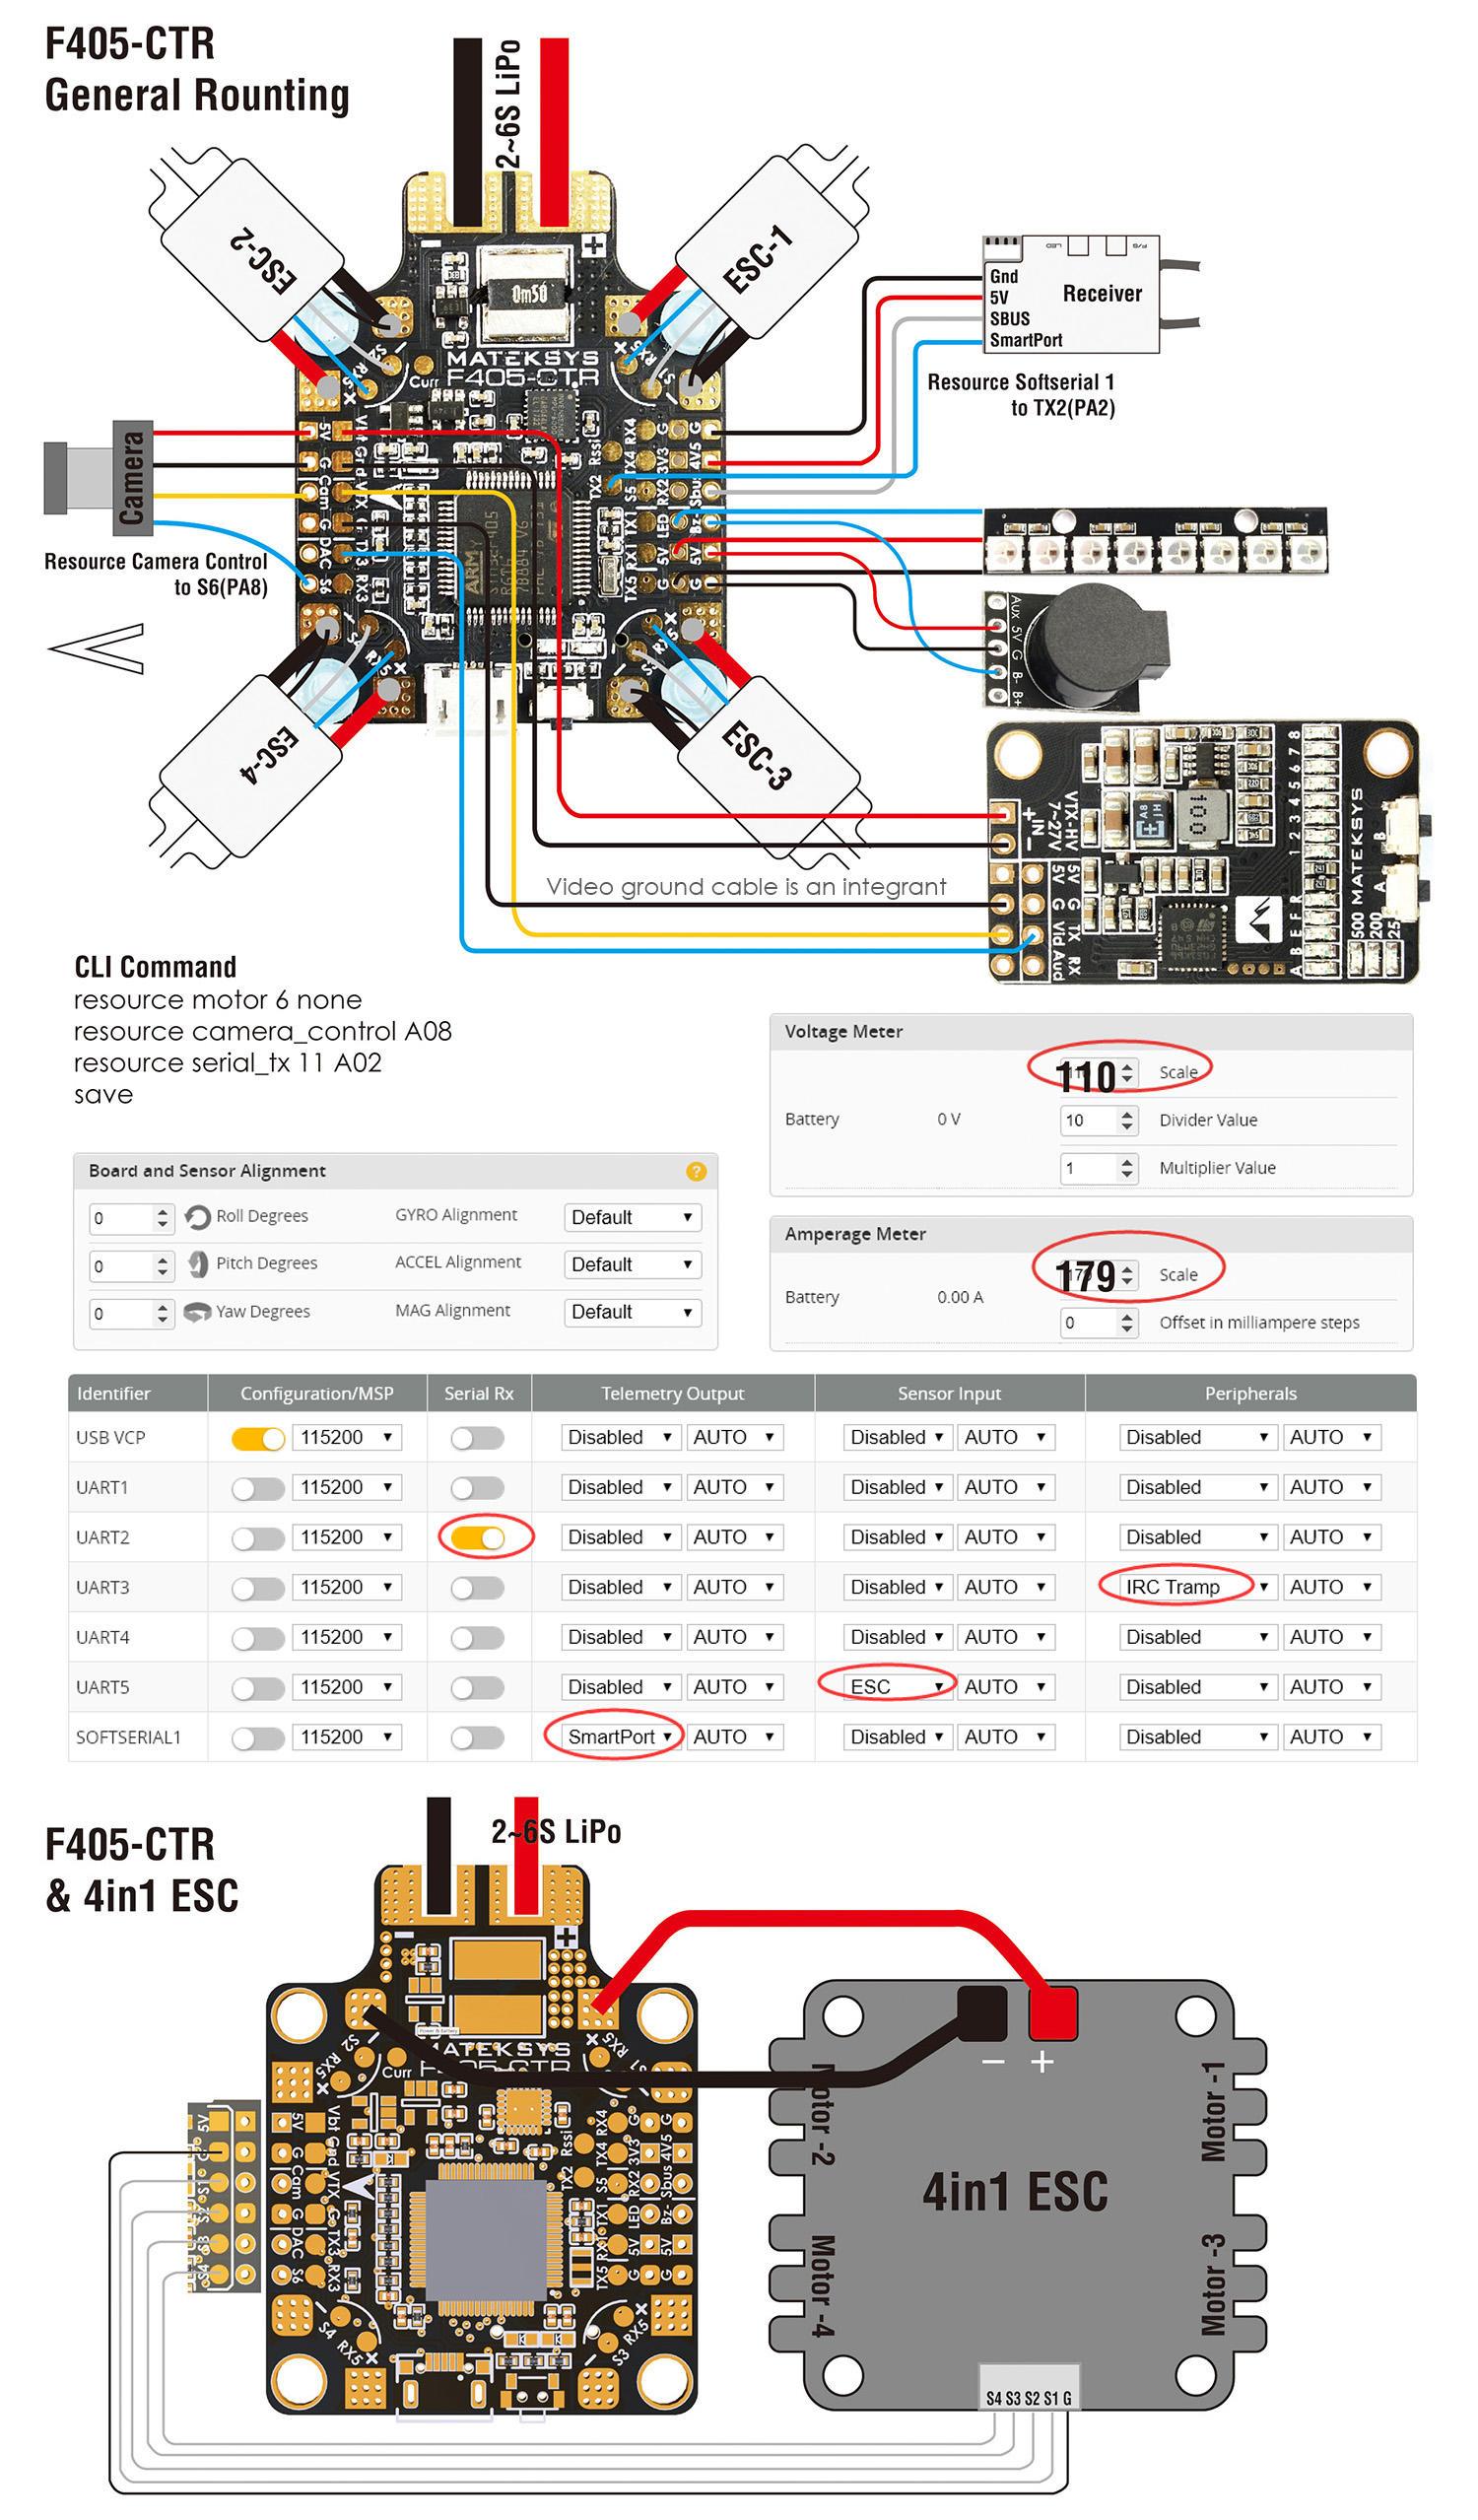 f405-ctr-bf1.jpg